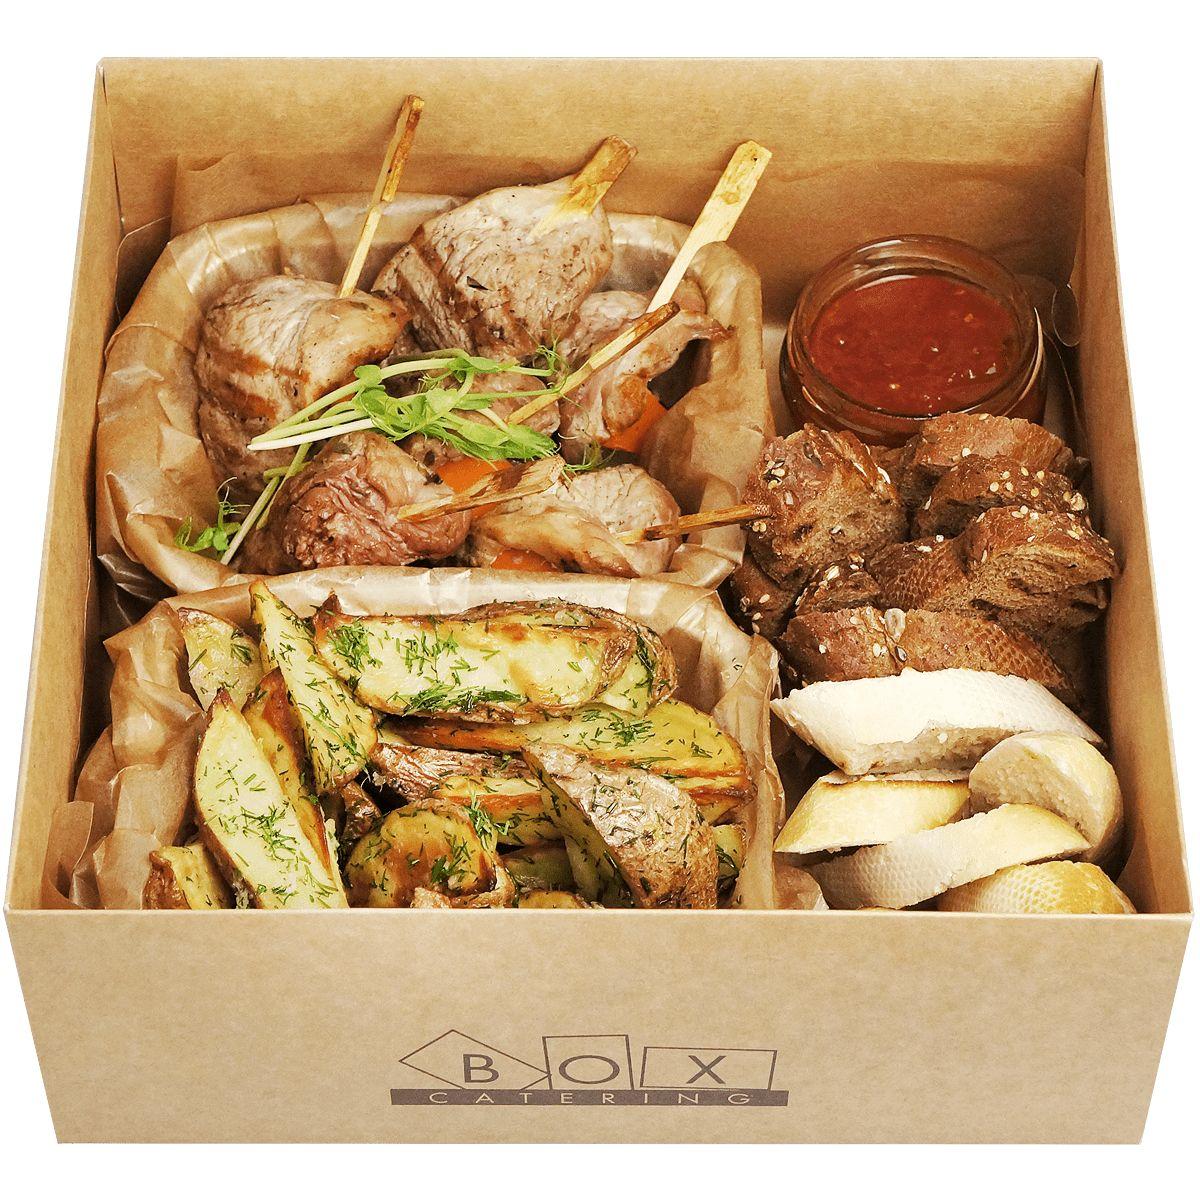 Hot pork box фото 2